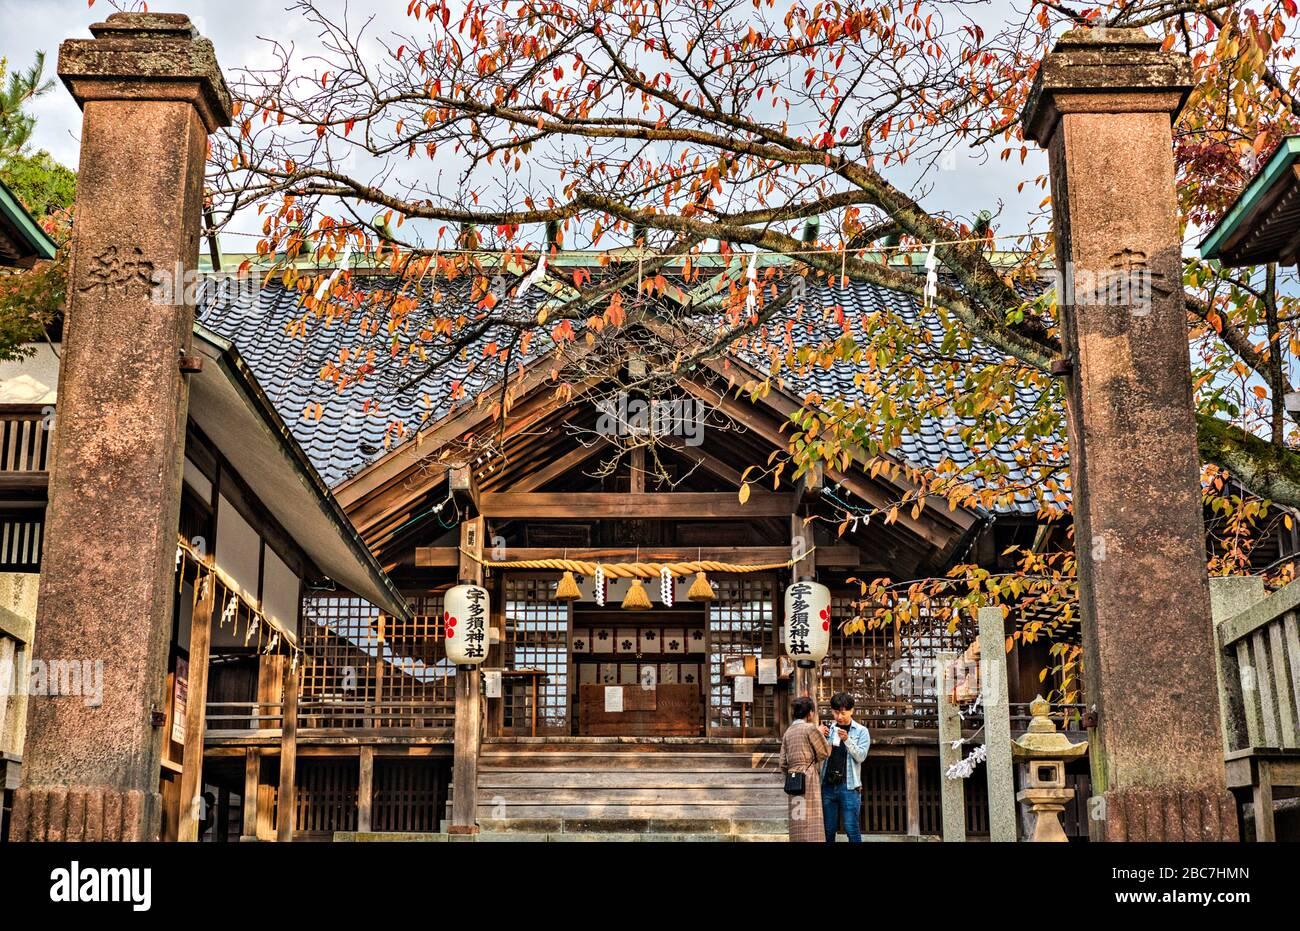 Sanctuaire d'Utasu à Higashi Chaya-gai, Kanazawa, Japon. Banque D'Images